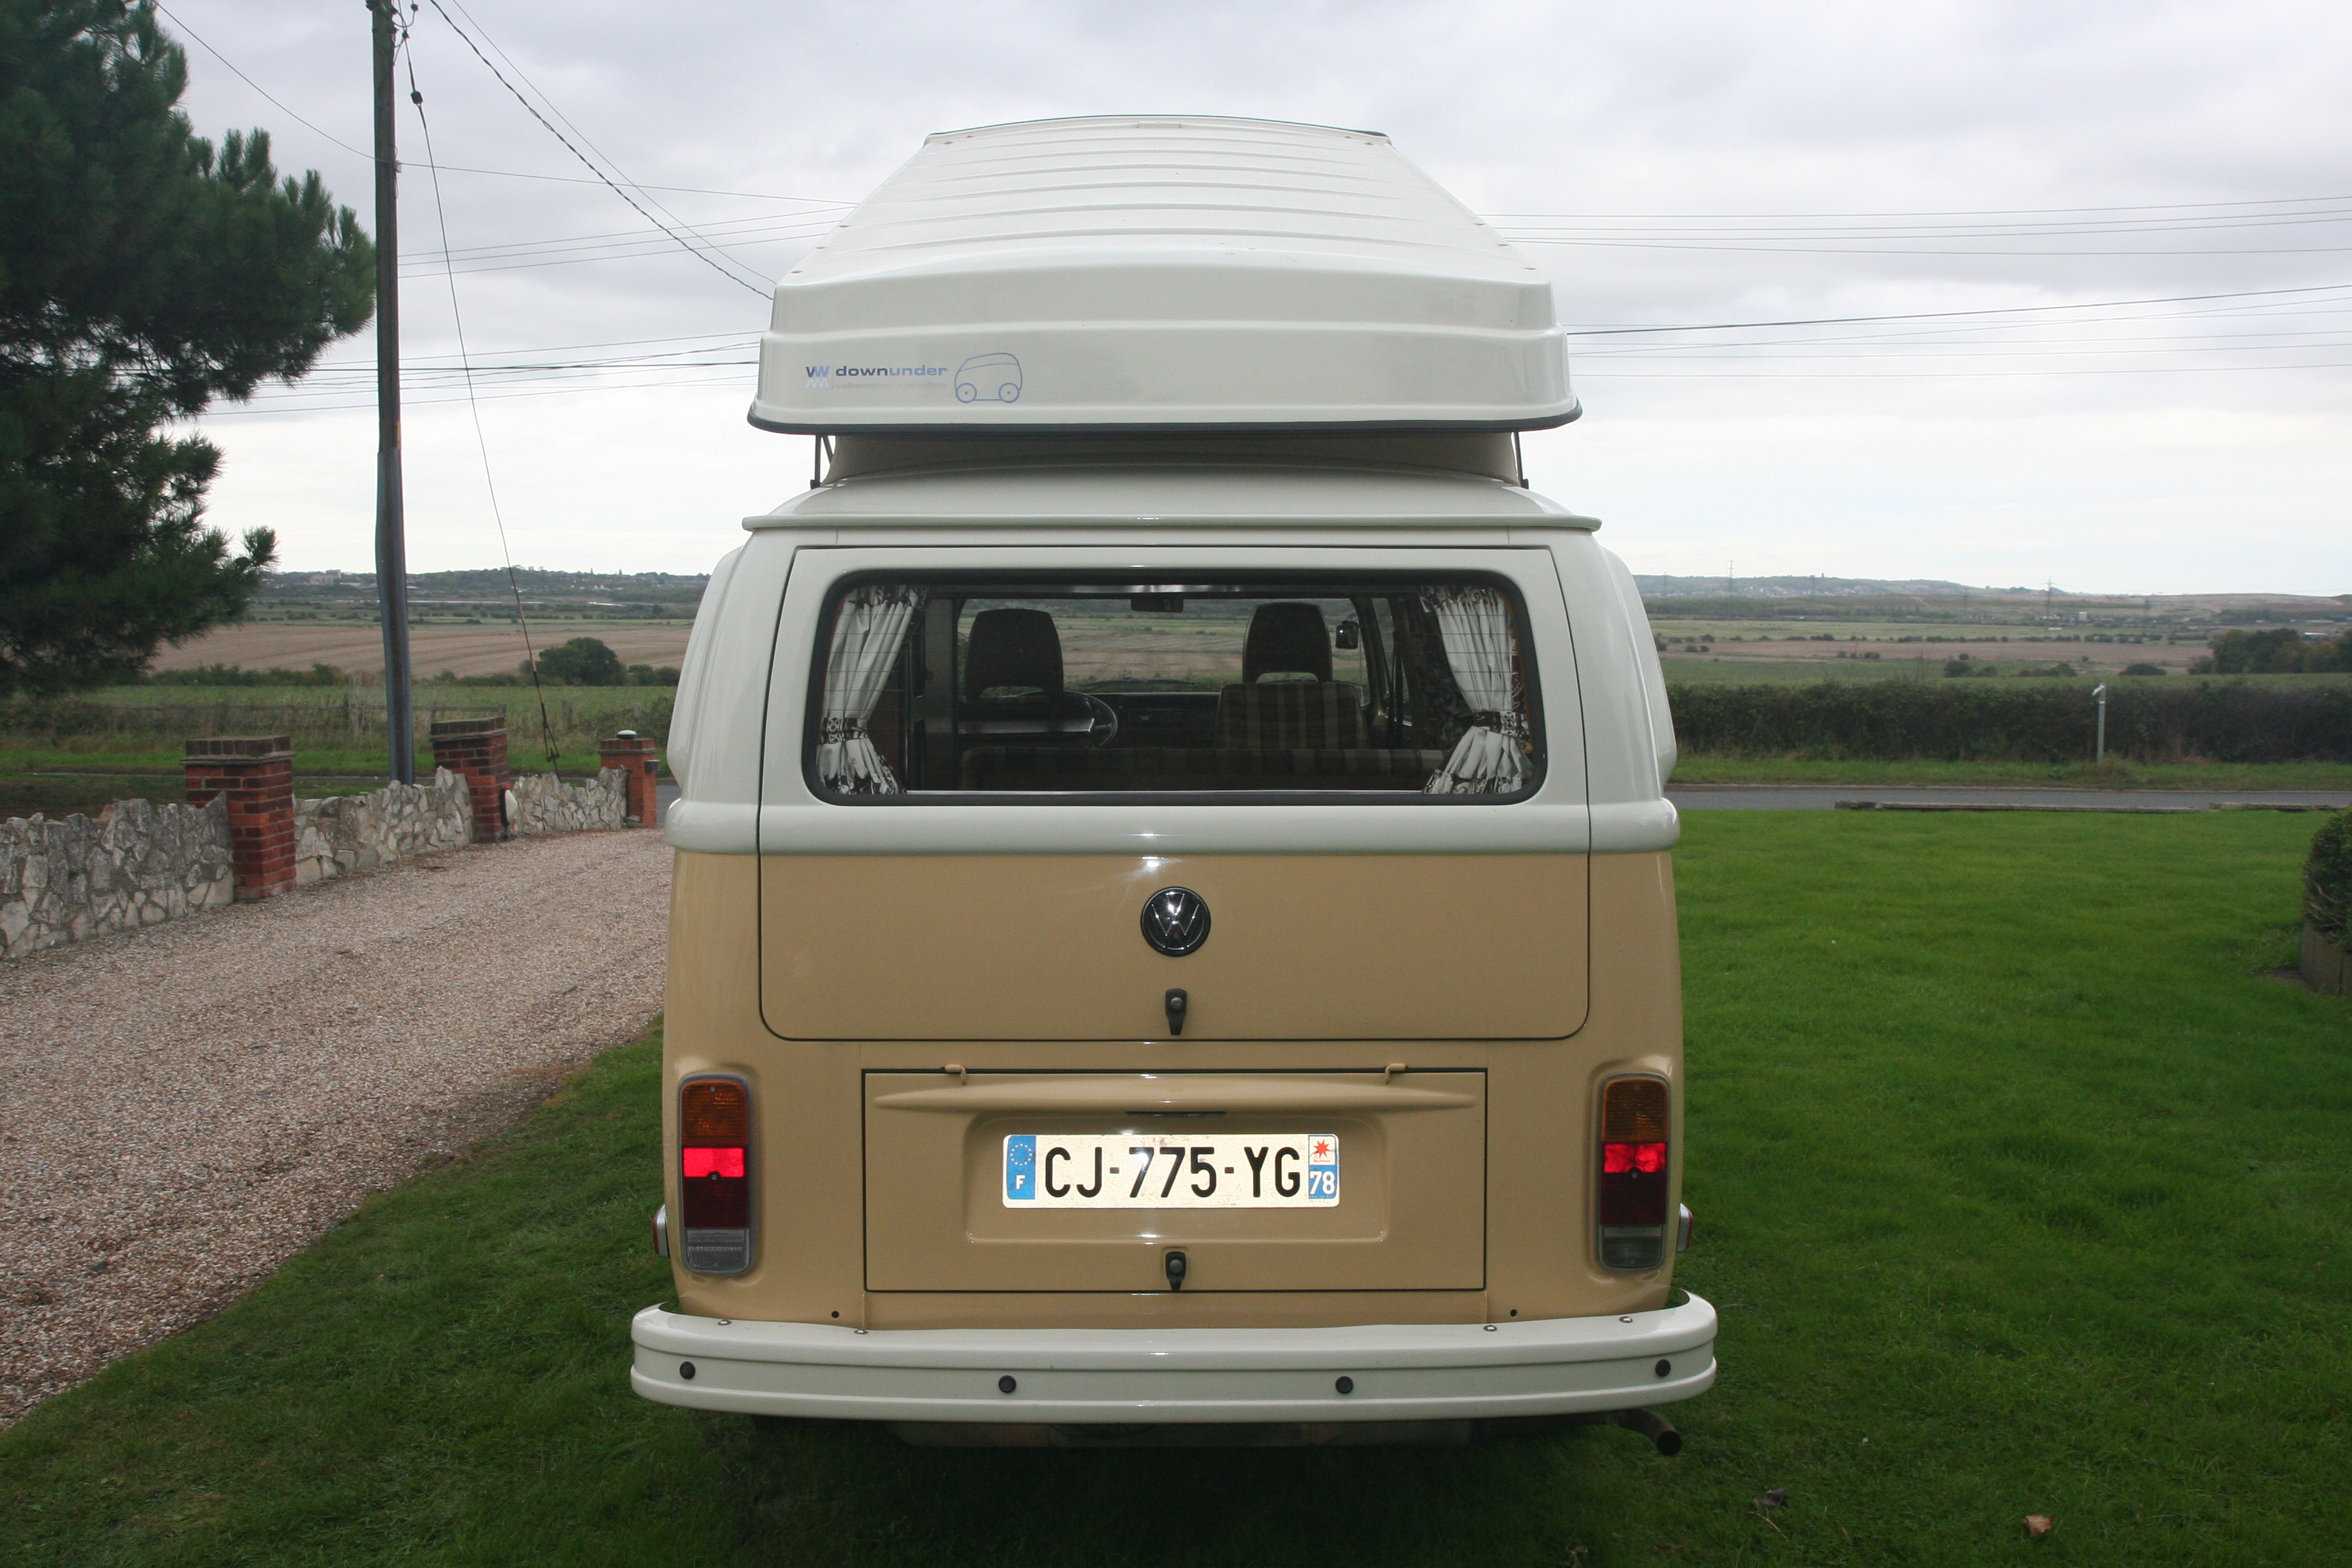 Westfalia Camper Van For Sale